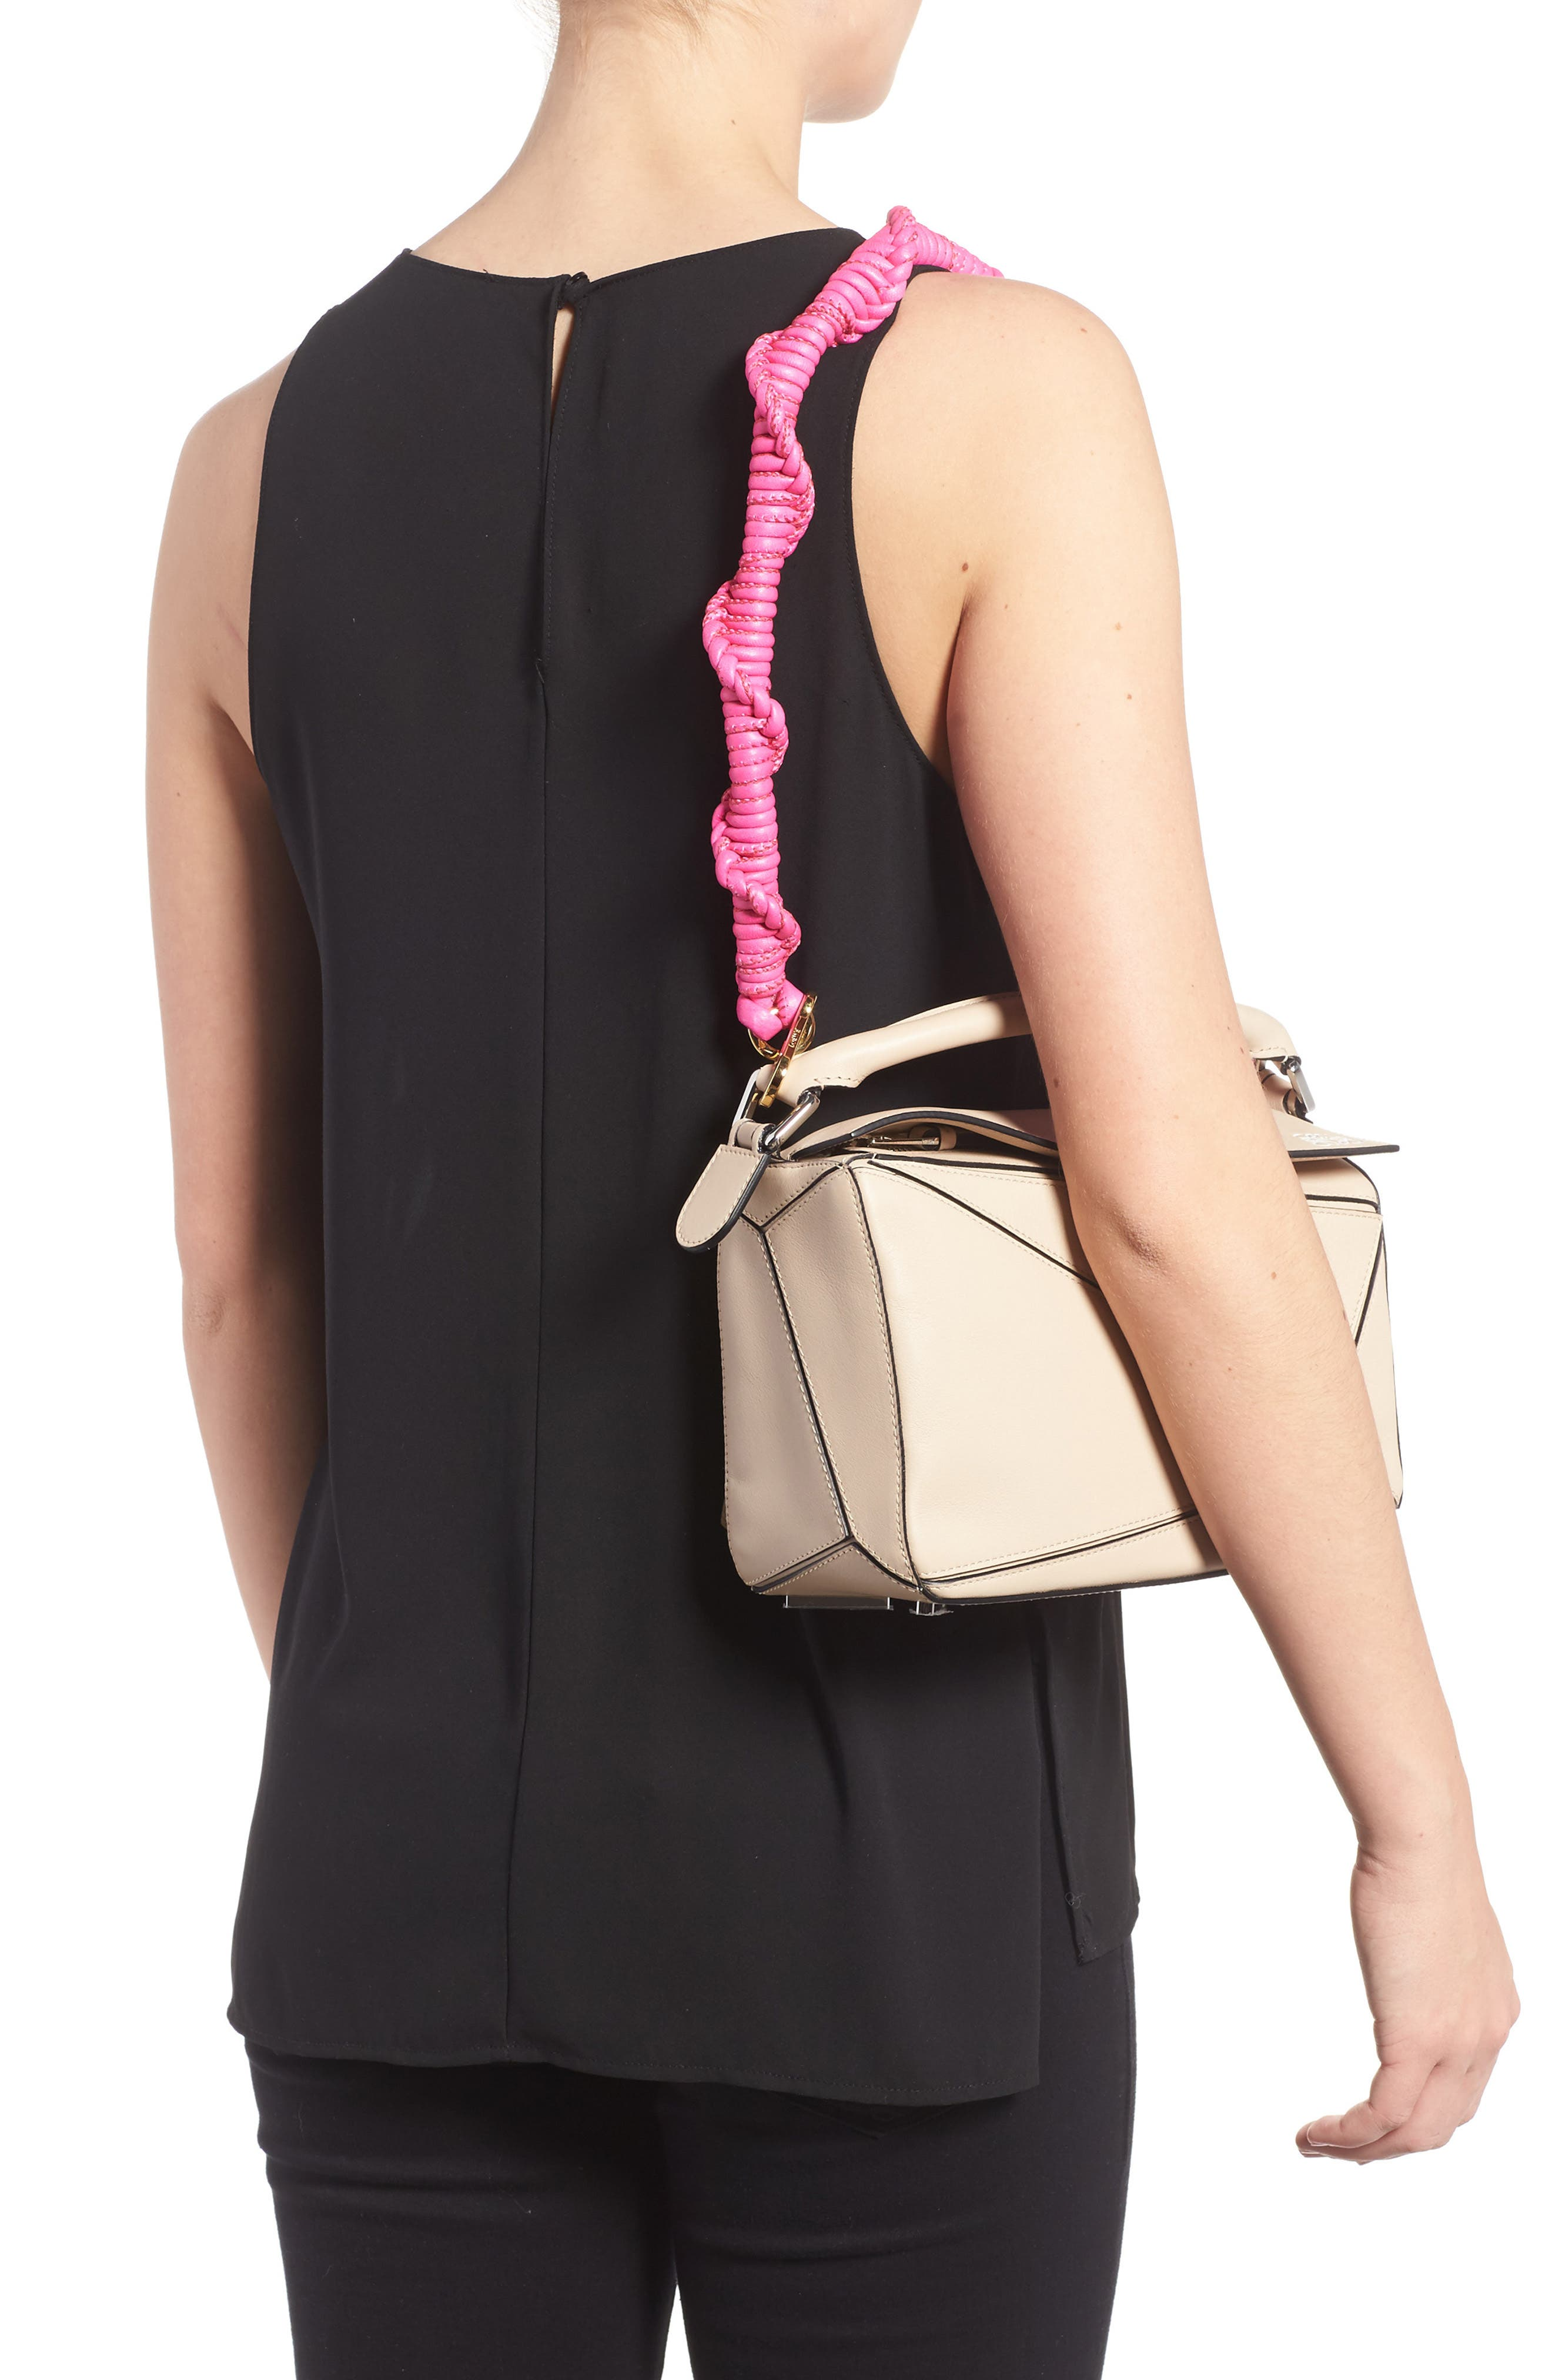 Braided Leather Bag Strap,                             Alternate thumbnail 2, color,                             SHOCKING PINK